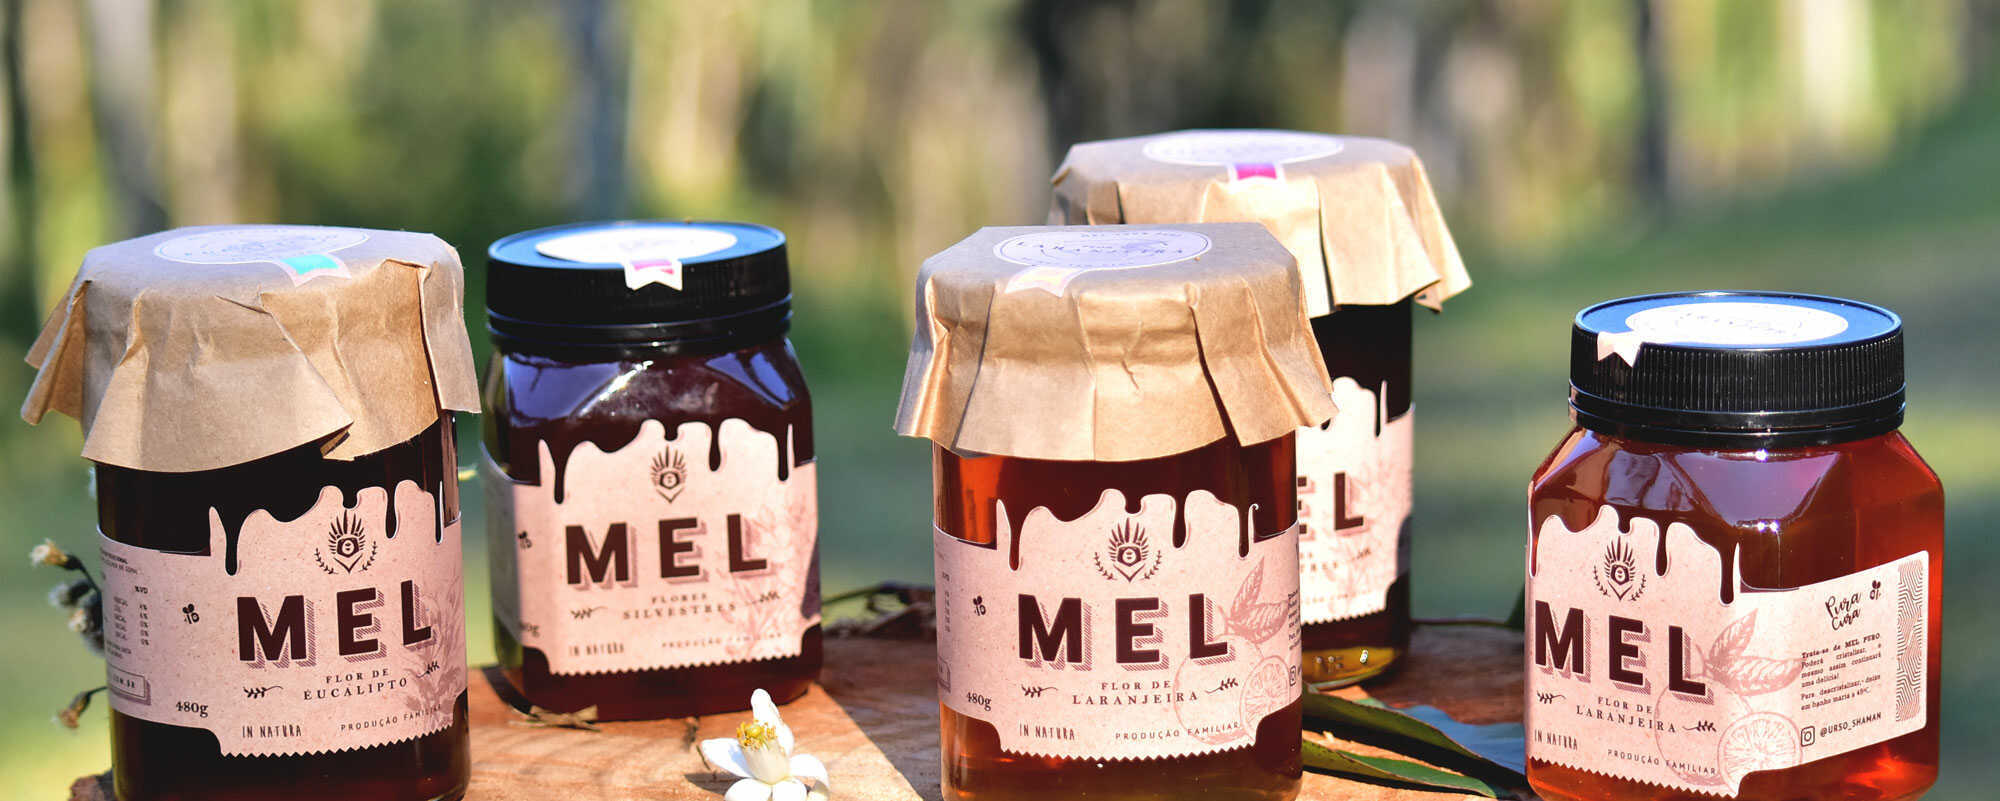 mel-abelha-puro-comprar-vender-sao-paulo-sp-loja